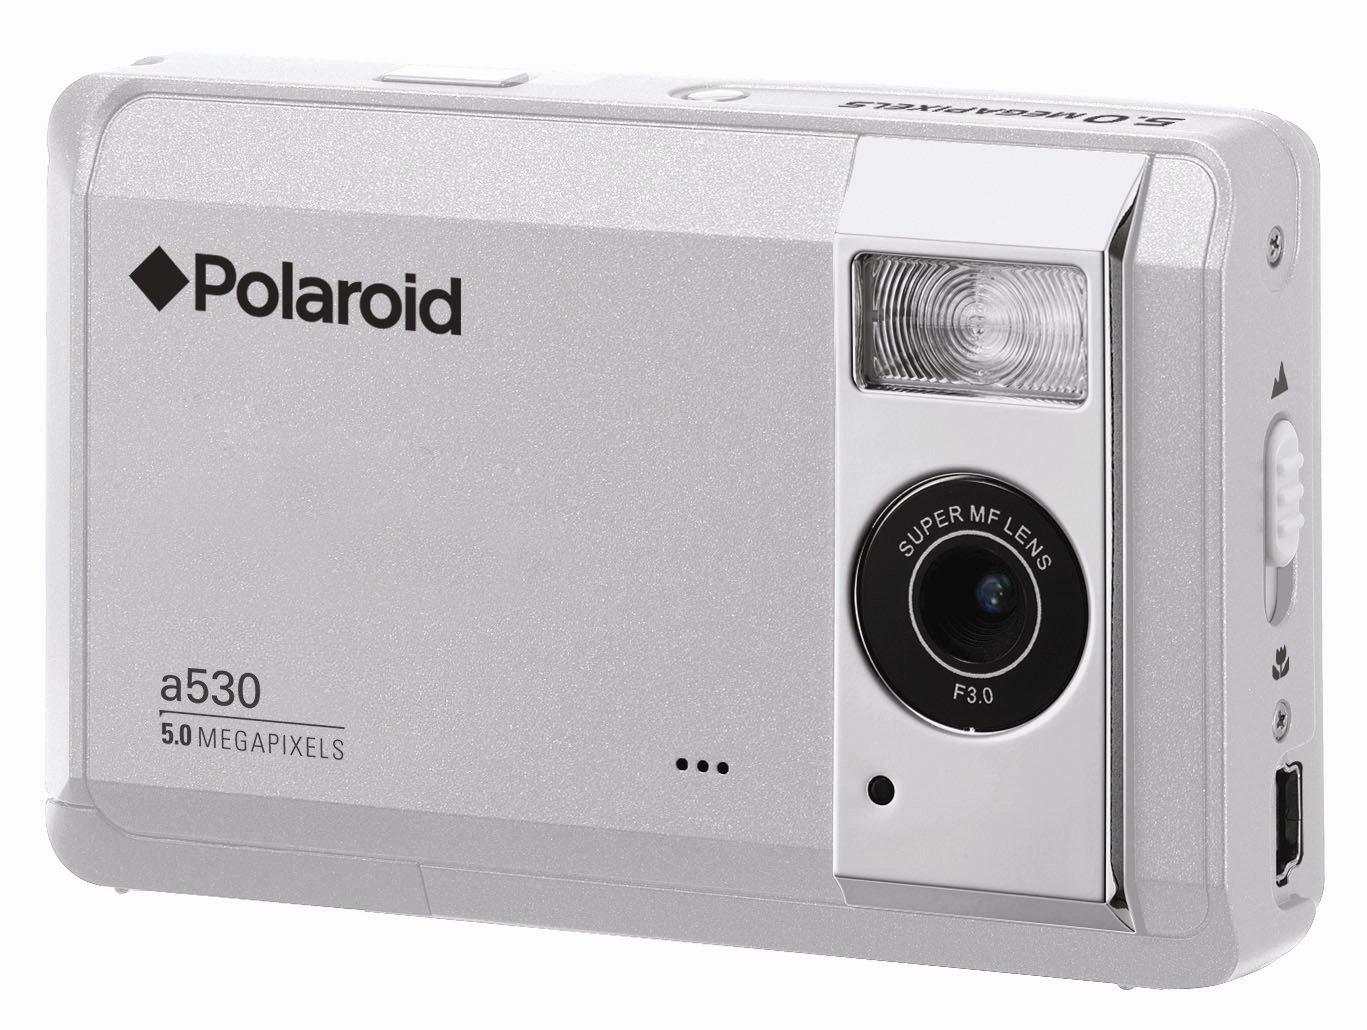 Amazon.com : Polaroid a530 5.0 Megapixel Digital Camera with 2.5-Inch LCD  Display : Kid Digital Camera Video : Camera & Photo